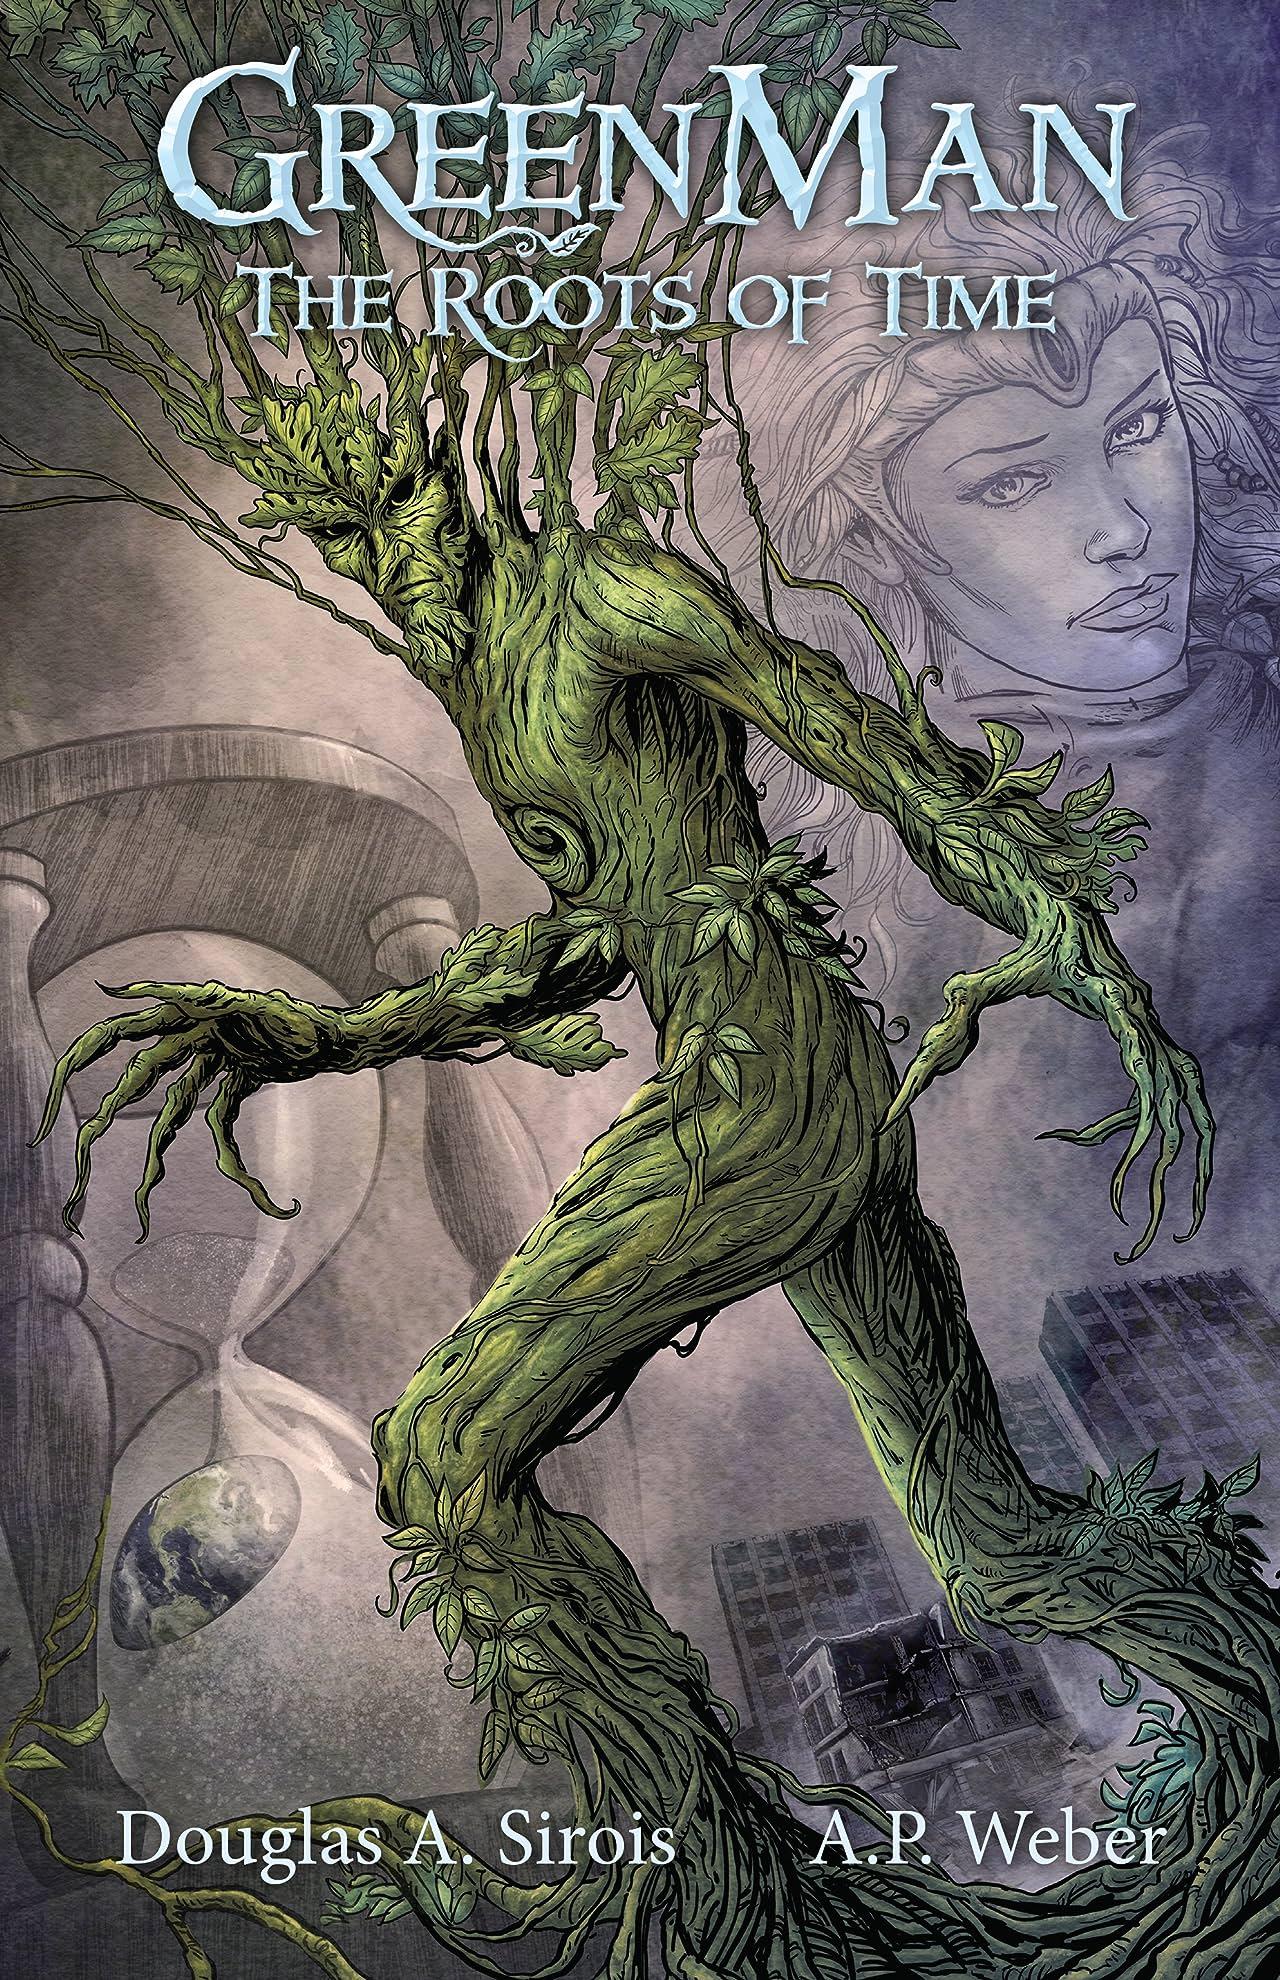 Green Man #1